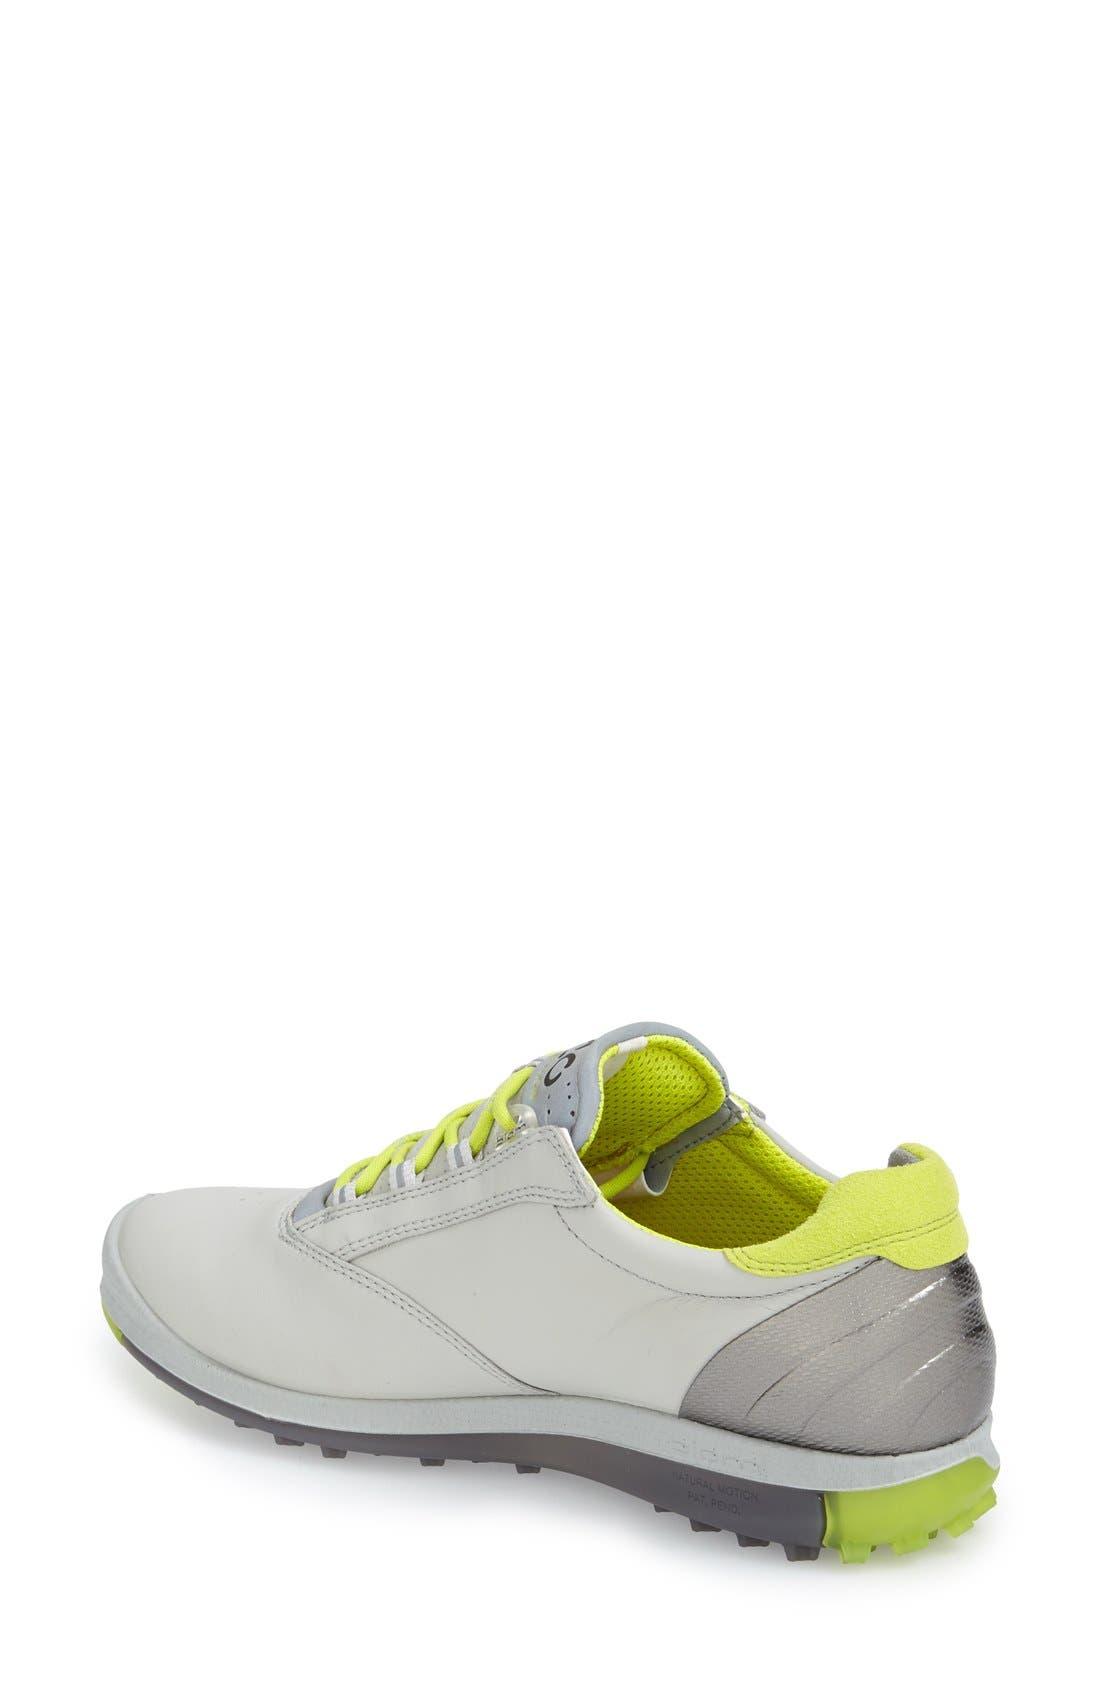 'BIOM' Hydromax<sup>®</sup> Waterproof Golf Shoe,                             Alternate thumbnail 19, color,